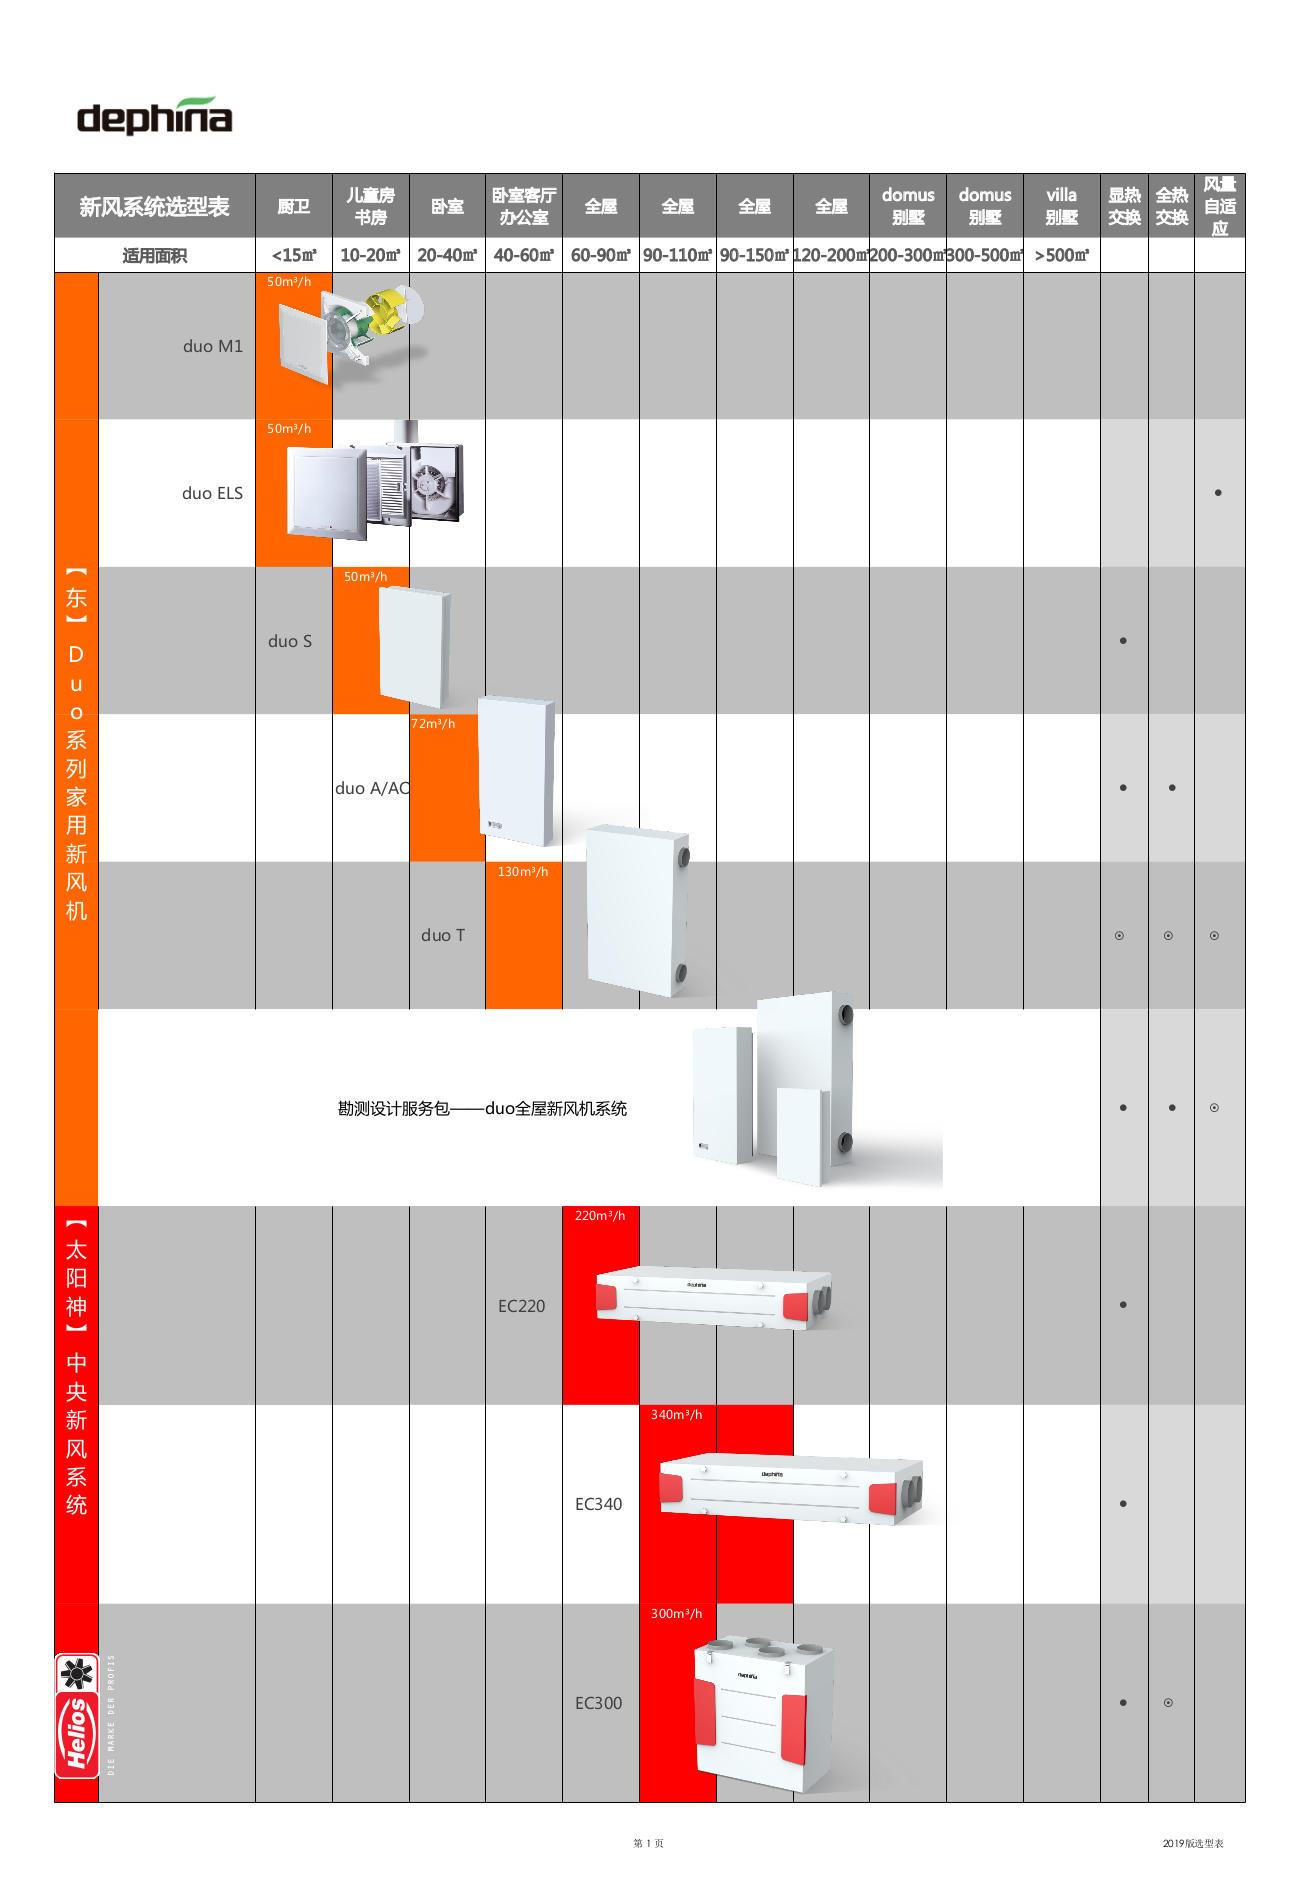 Dephina家用新风机中央新风系统价格选型表-1